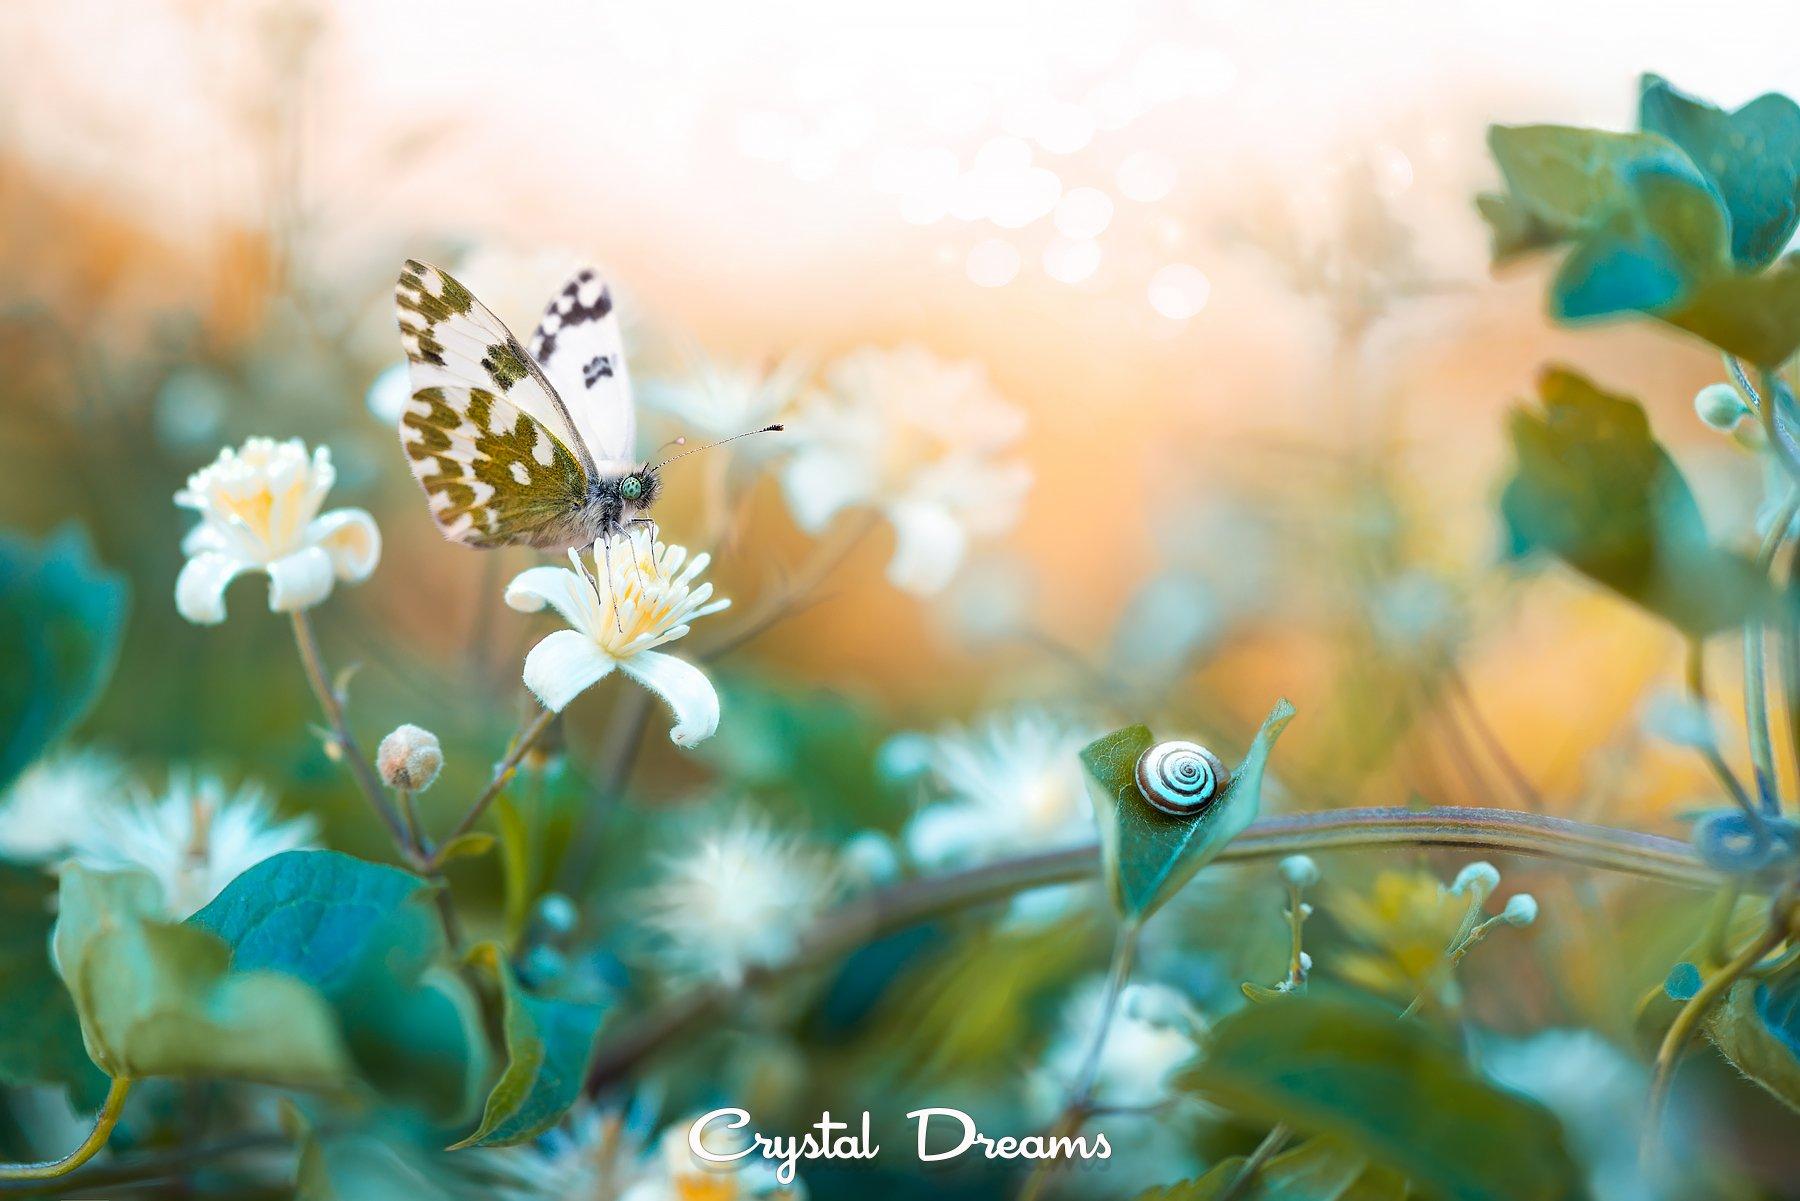 Art, Autumn, Butterfly, Color, Crystal Deams, Macro, Nature, Snail, Sunset, Крылова Татьяна